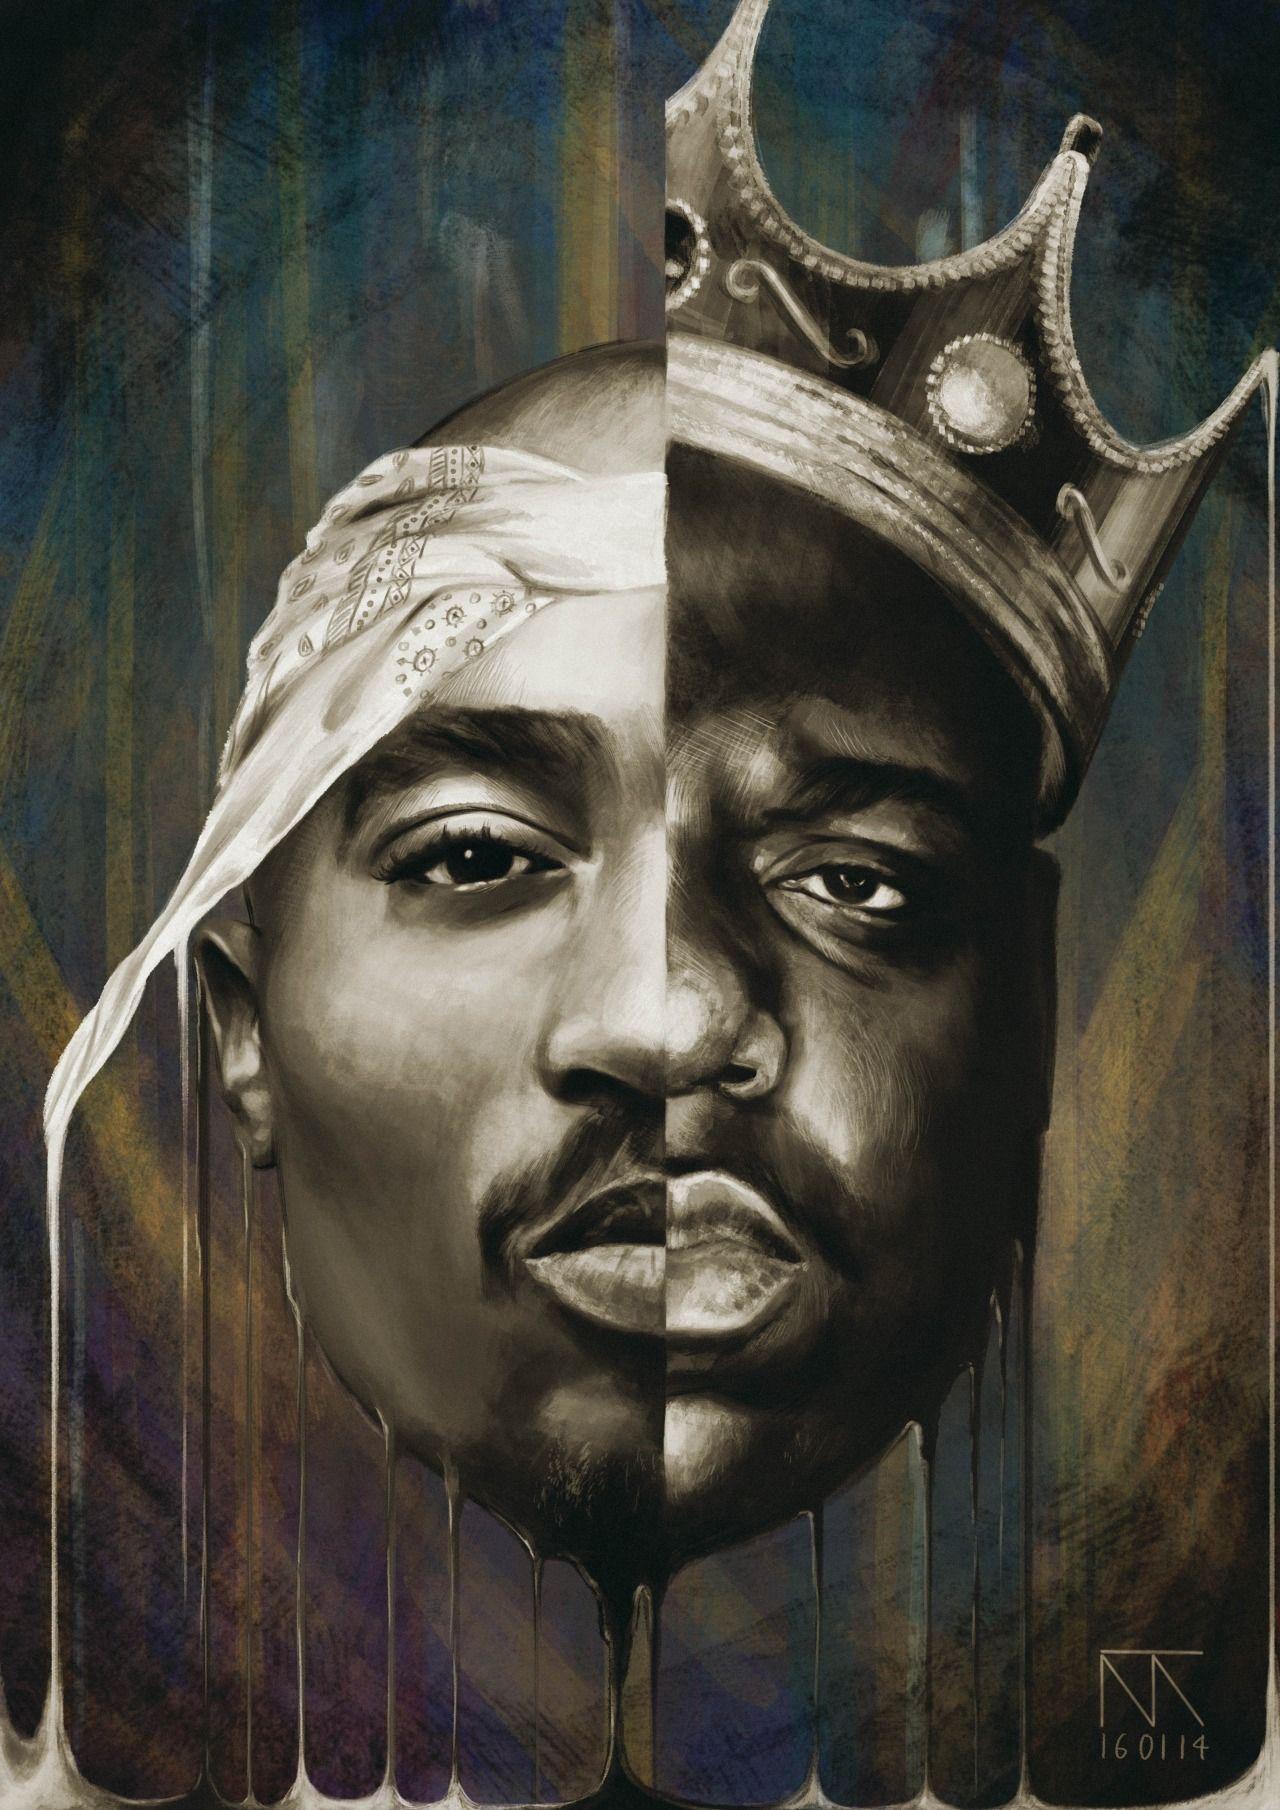 D098 Hip Hop Music Last Supper 2pac Tupac Biggie Smalls Notorious Poster Decor